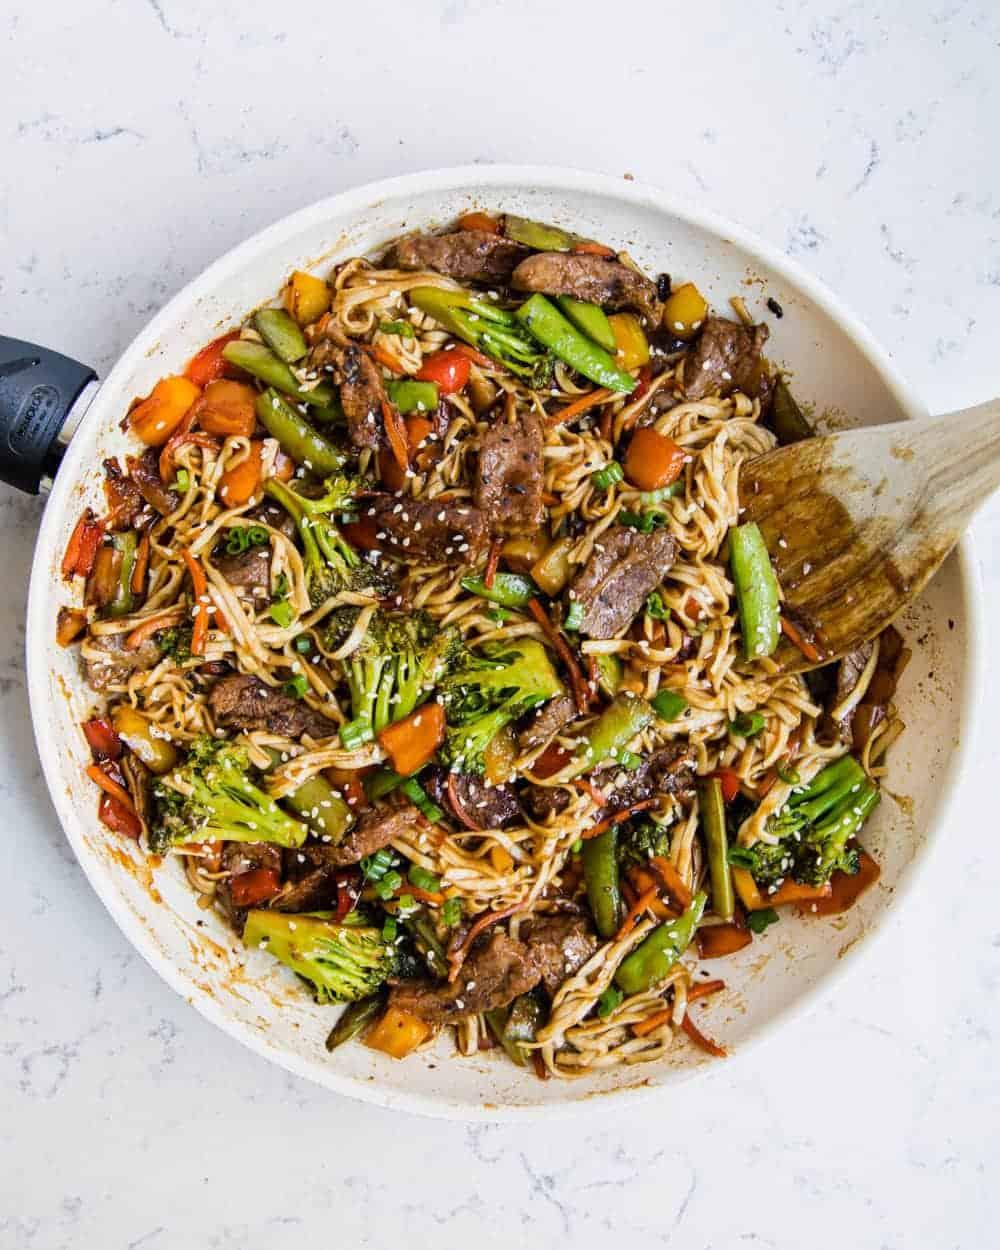 beef ramen recipe in pan with wooden spoon